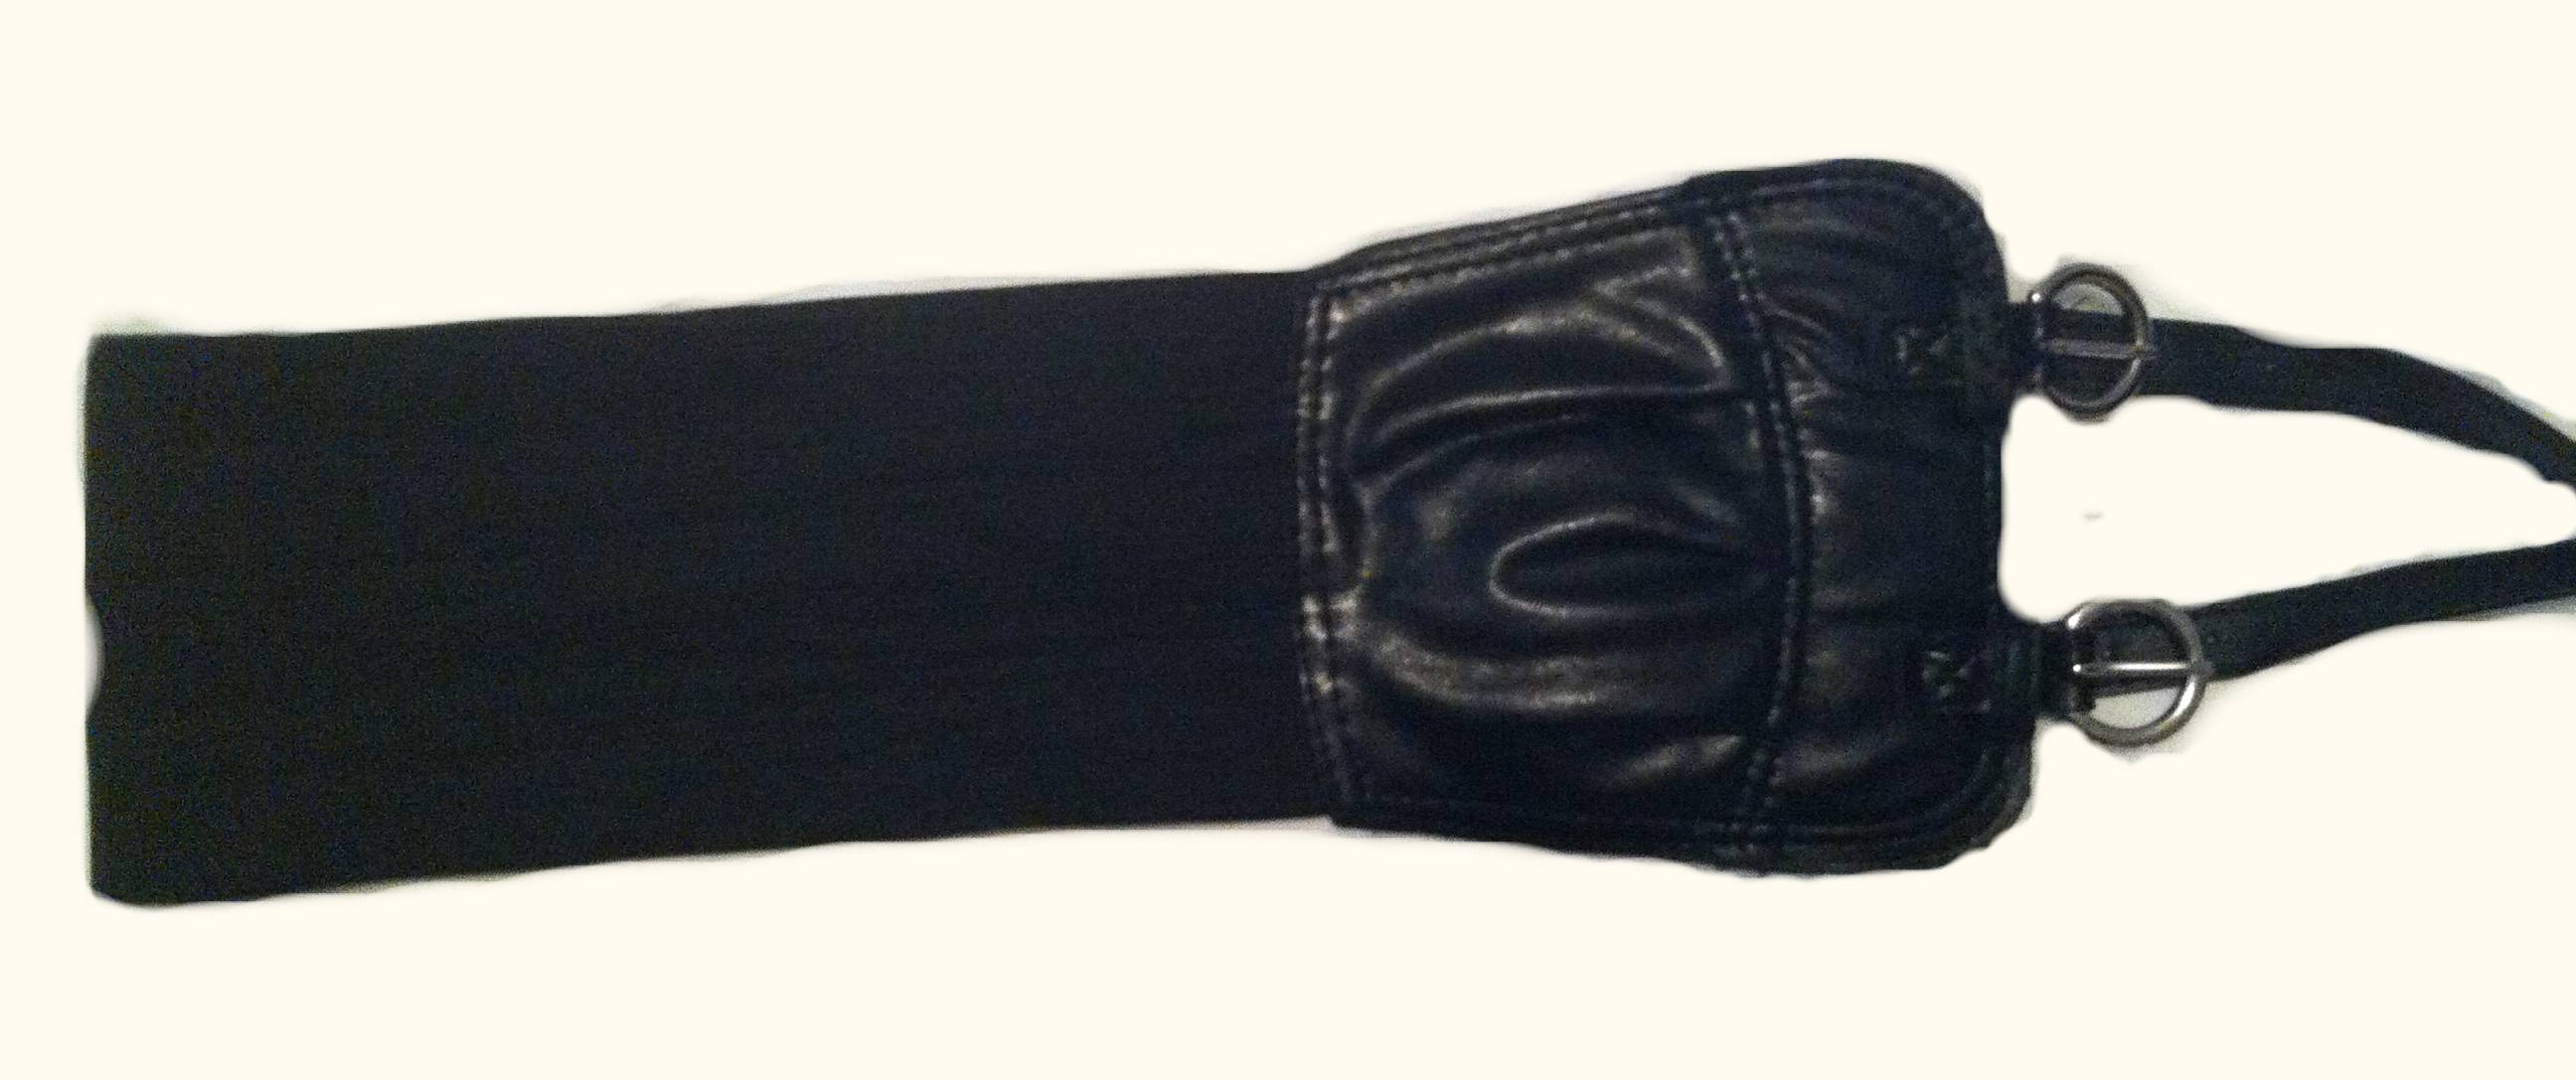 wide black stretch belt 183 the glam suite atl 183